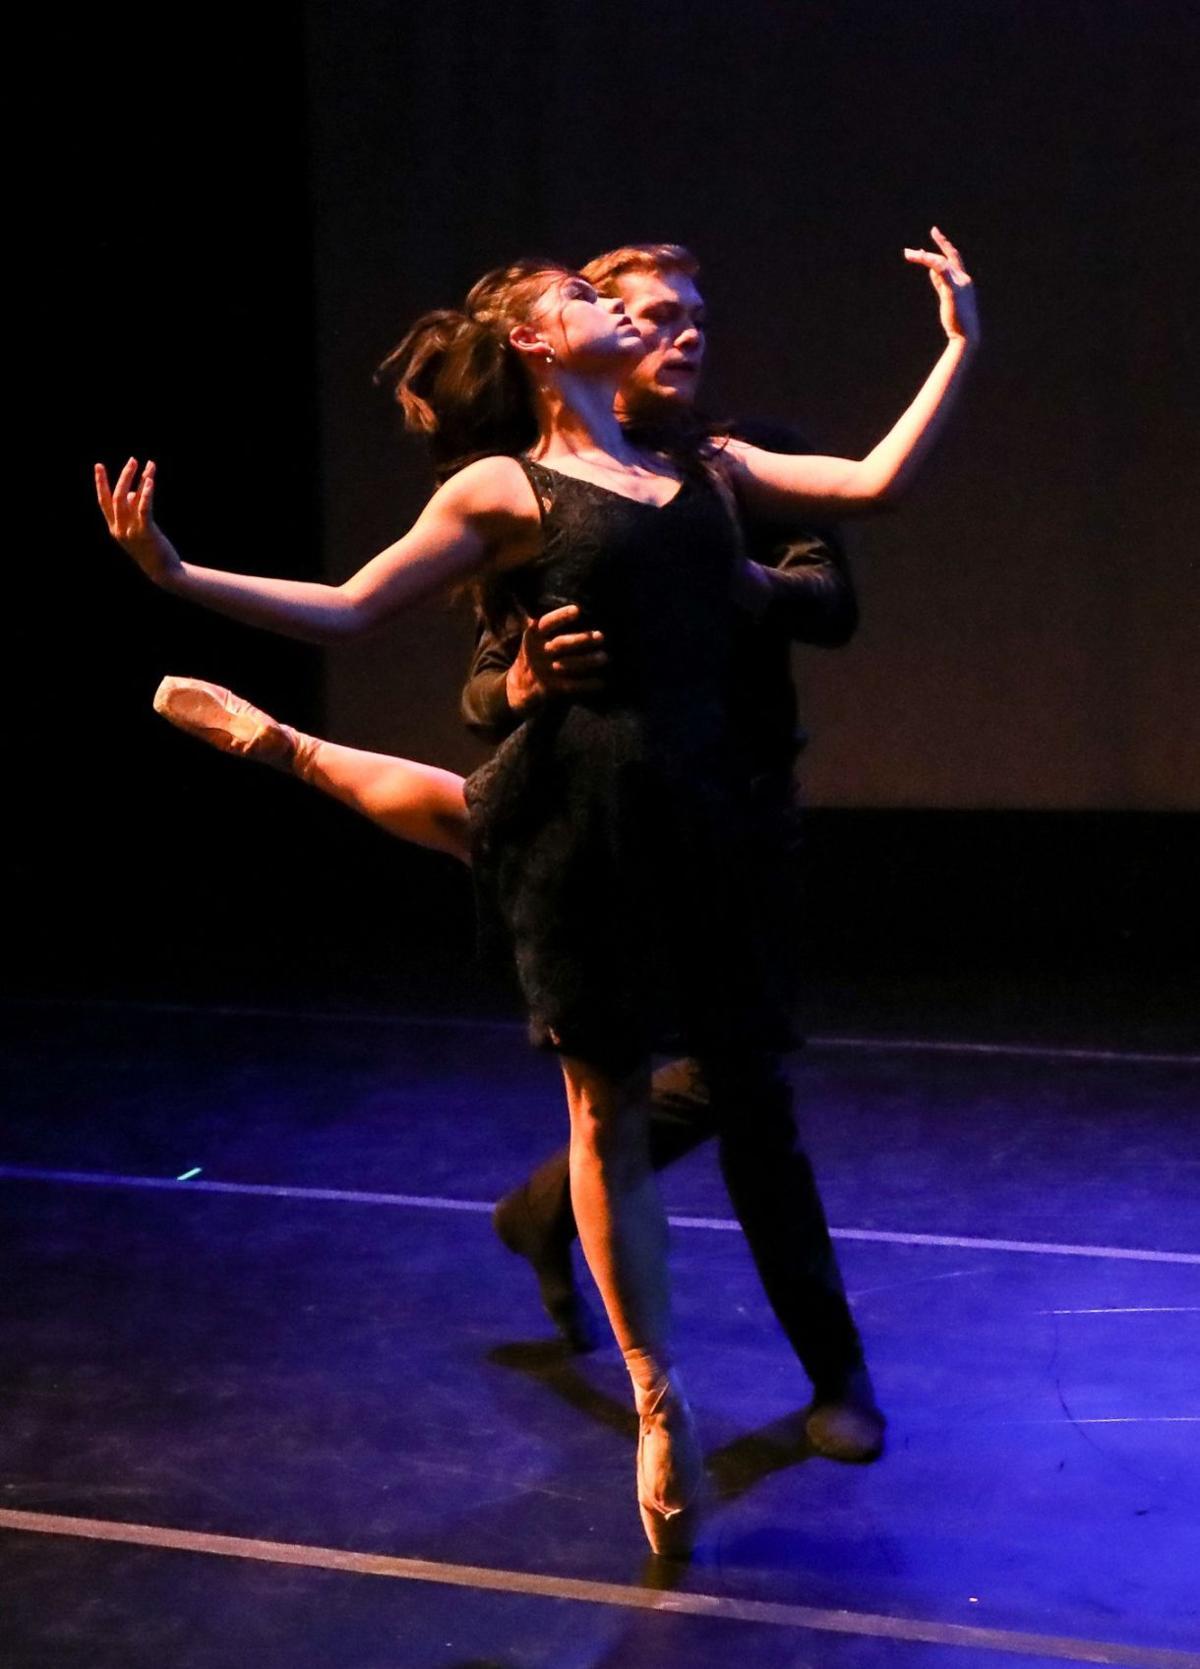 "Rowan Allegra & Shea Johnson ""A New Normal"" - Choreography by Kristin Toner"